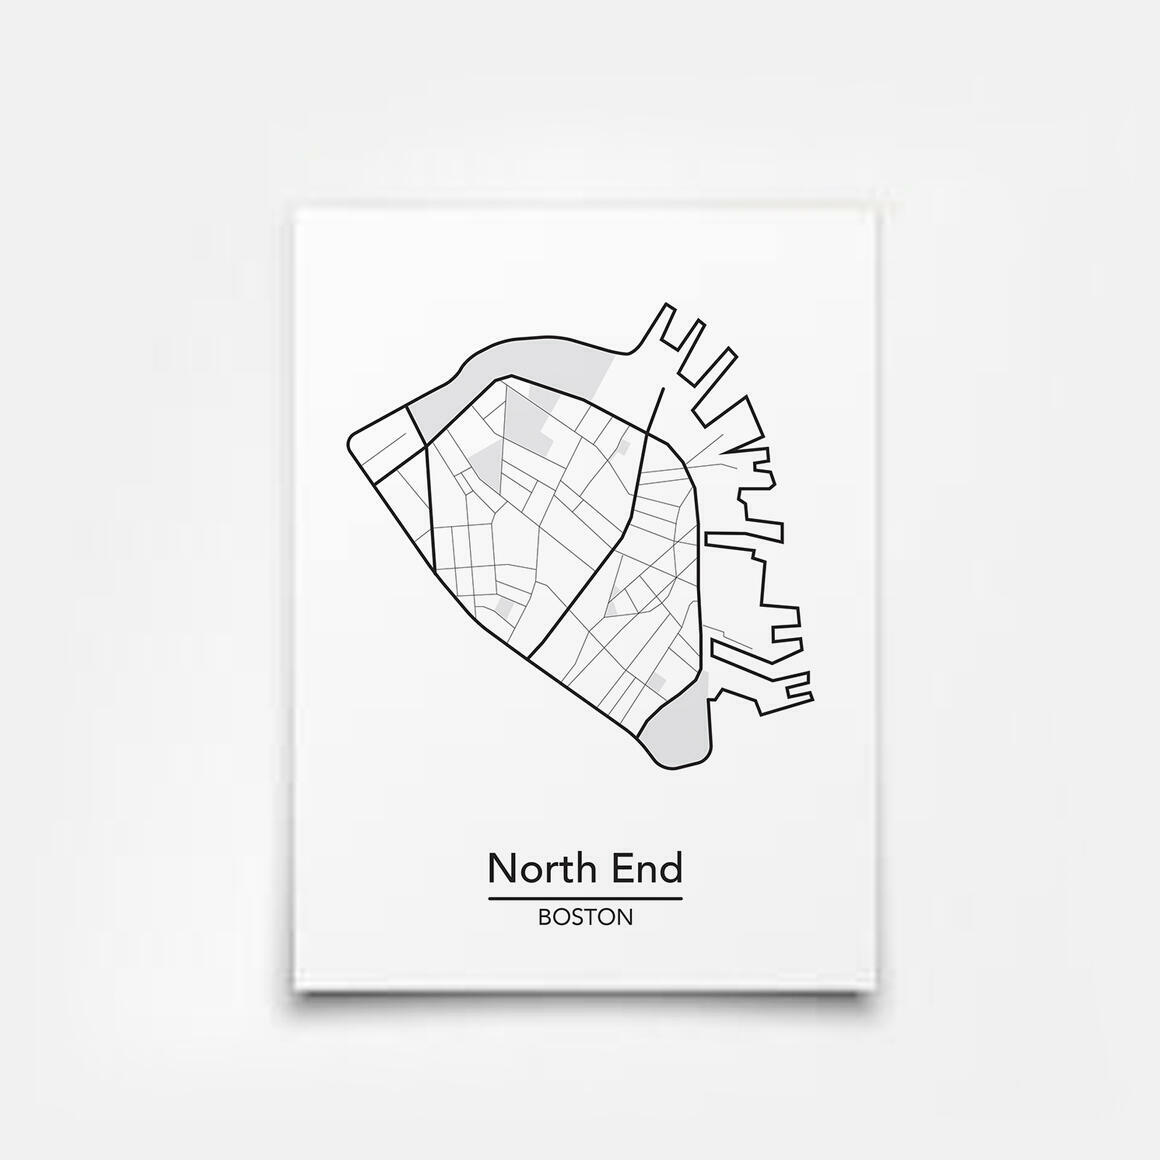 North End - Boston Neighborhood Map Print | Trada Marketplace